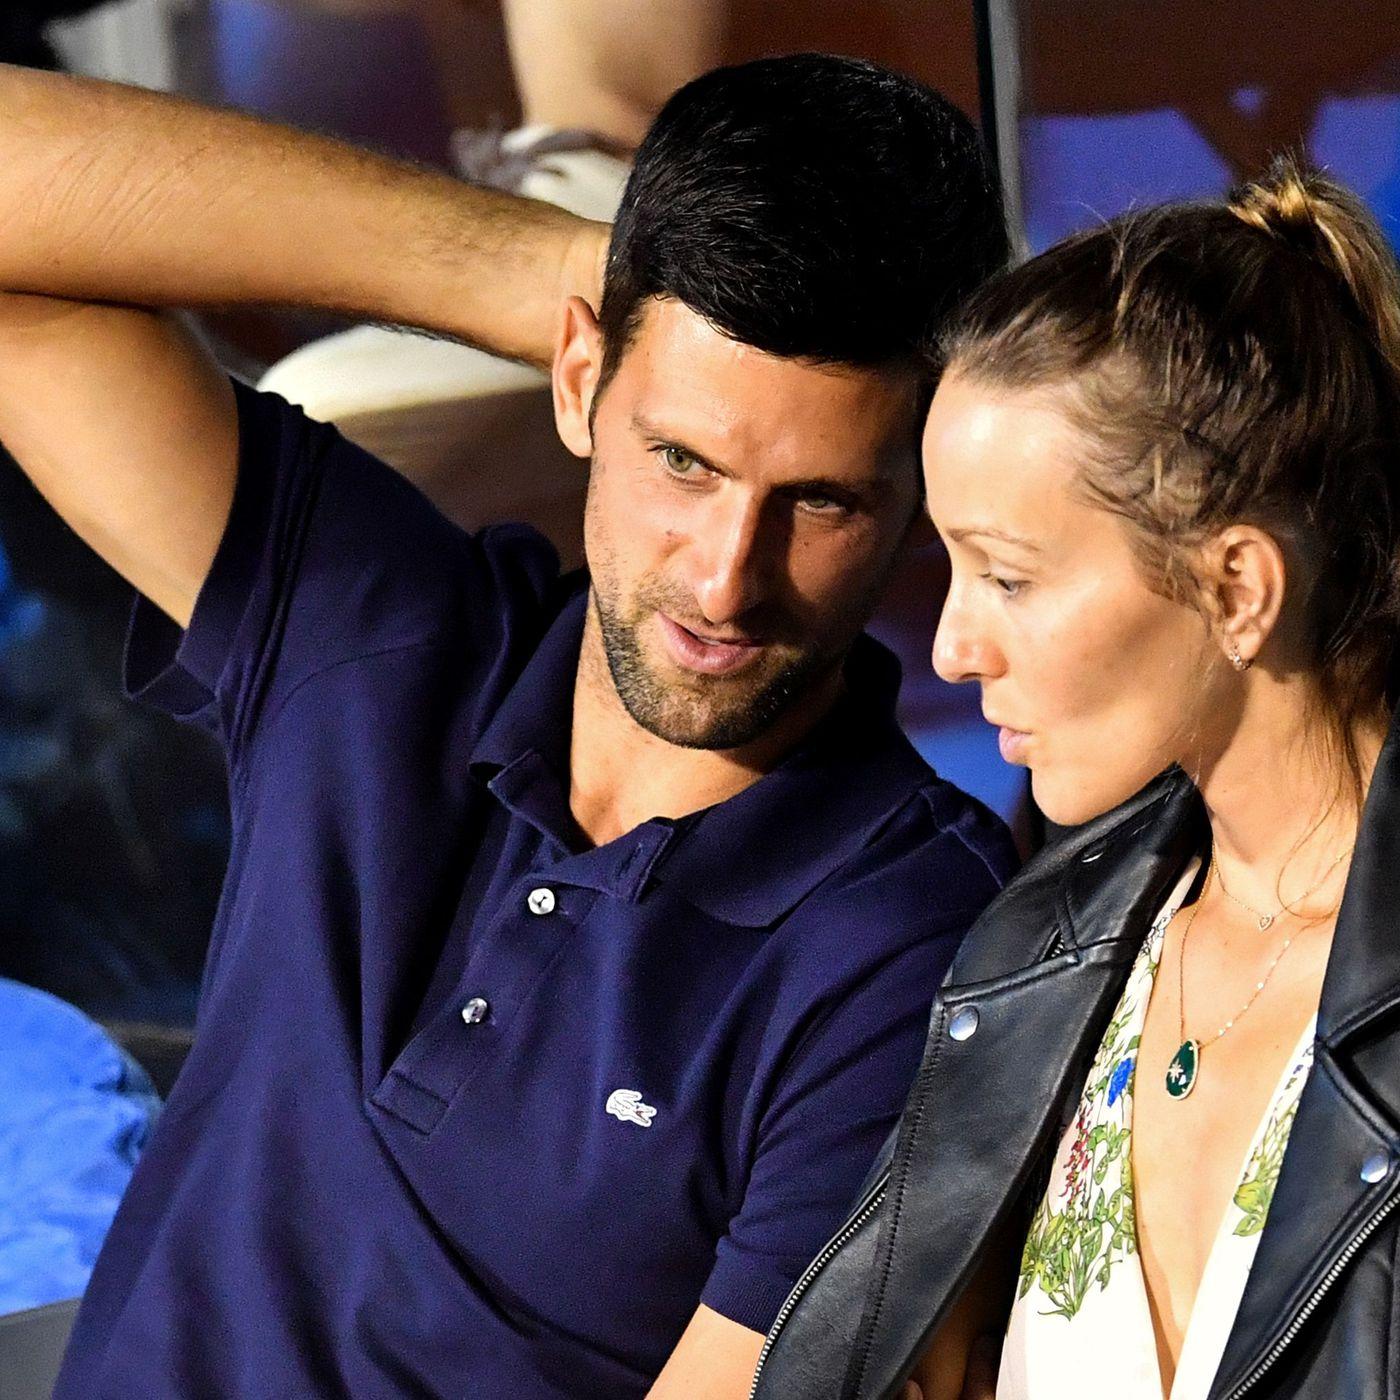 No 1 Novak Djokovic Wife Have Coronavirus After His Tennis Exhibitions Chicago Sun Times